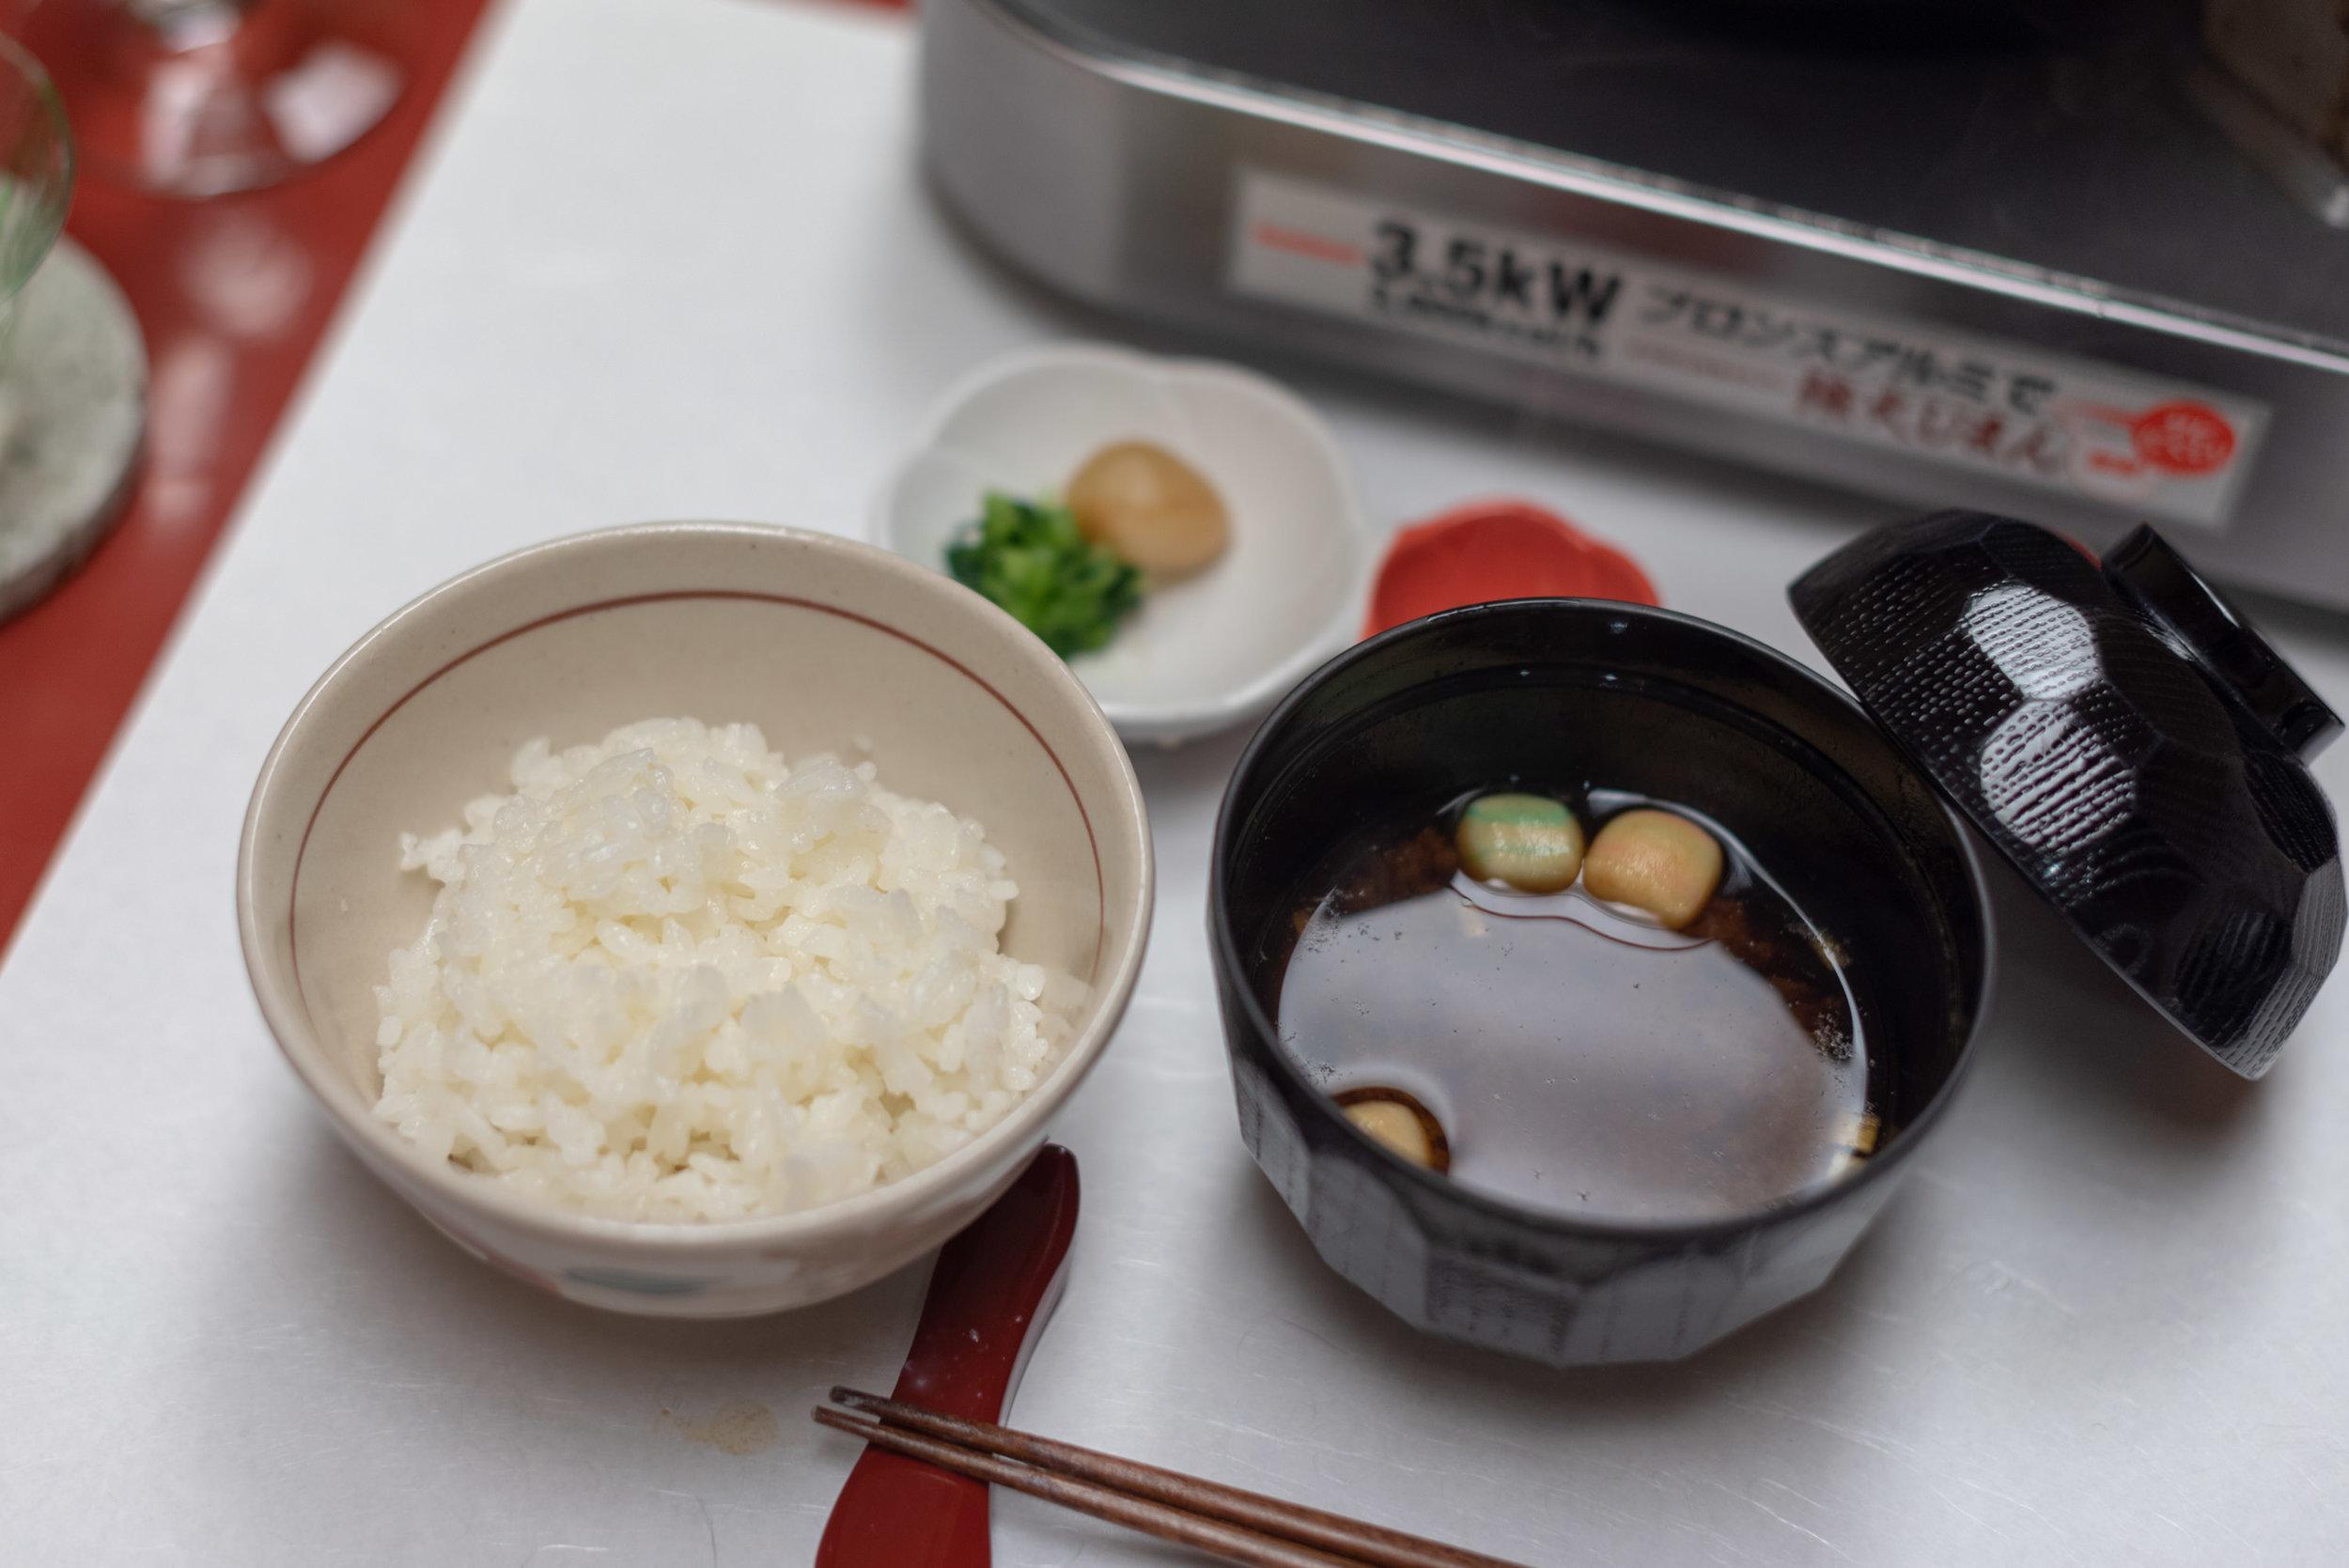 Rice and Miso Soup  Dinner - Hoshino Resorts KAI Nikko